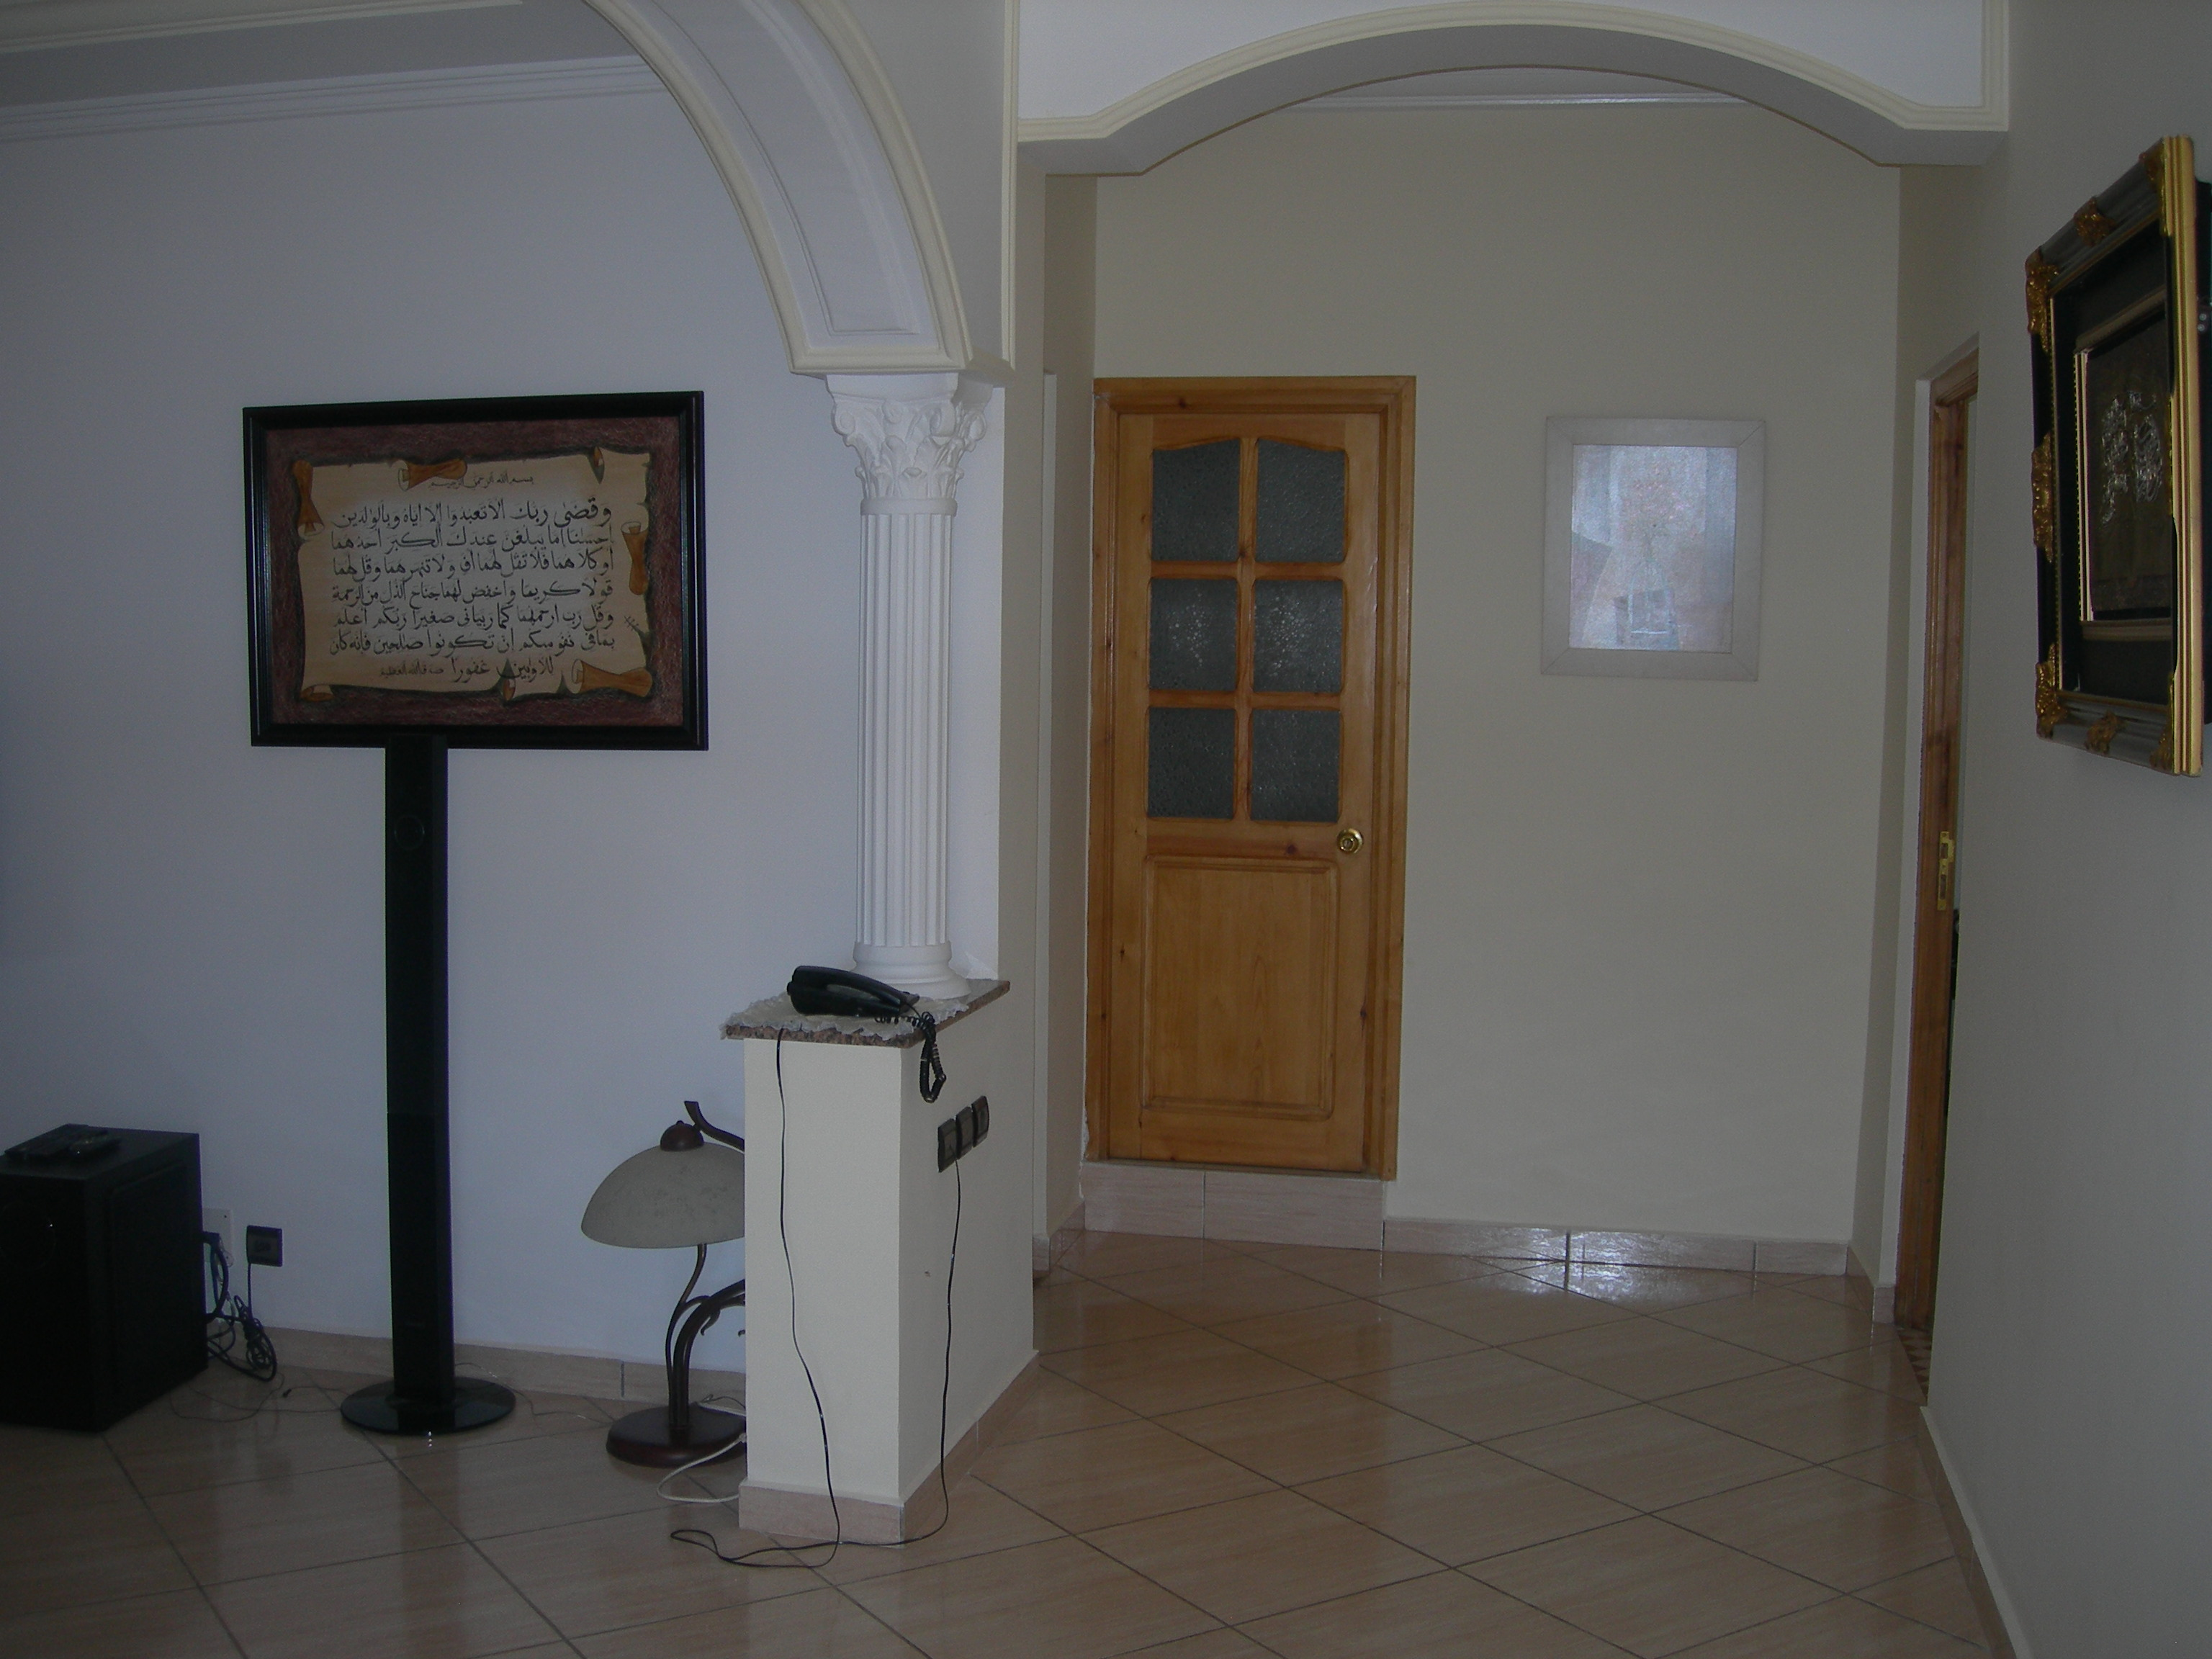 Verkoop 2 slaapkamers mdiq tetouan marokko sania torres mdiq - Slaapkamer marokko ...